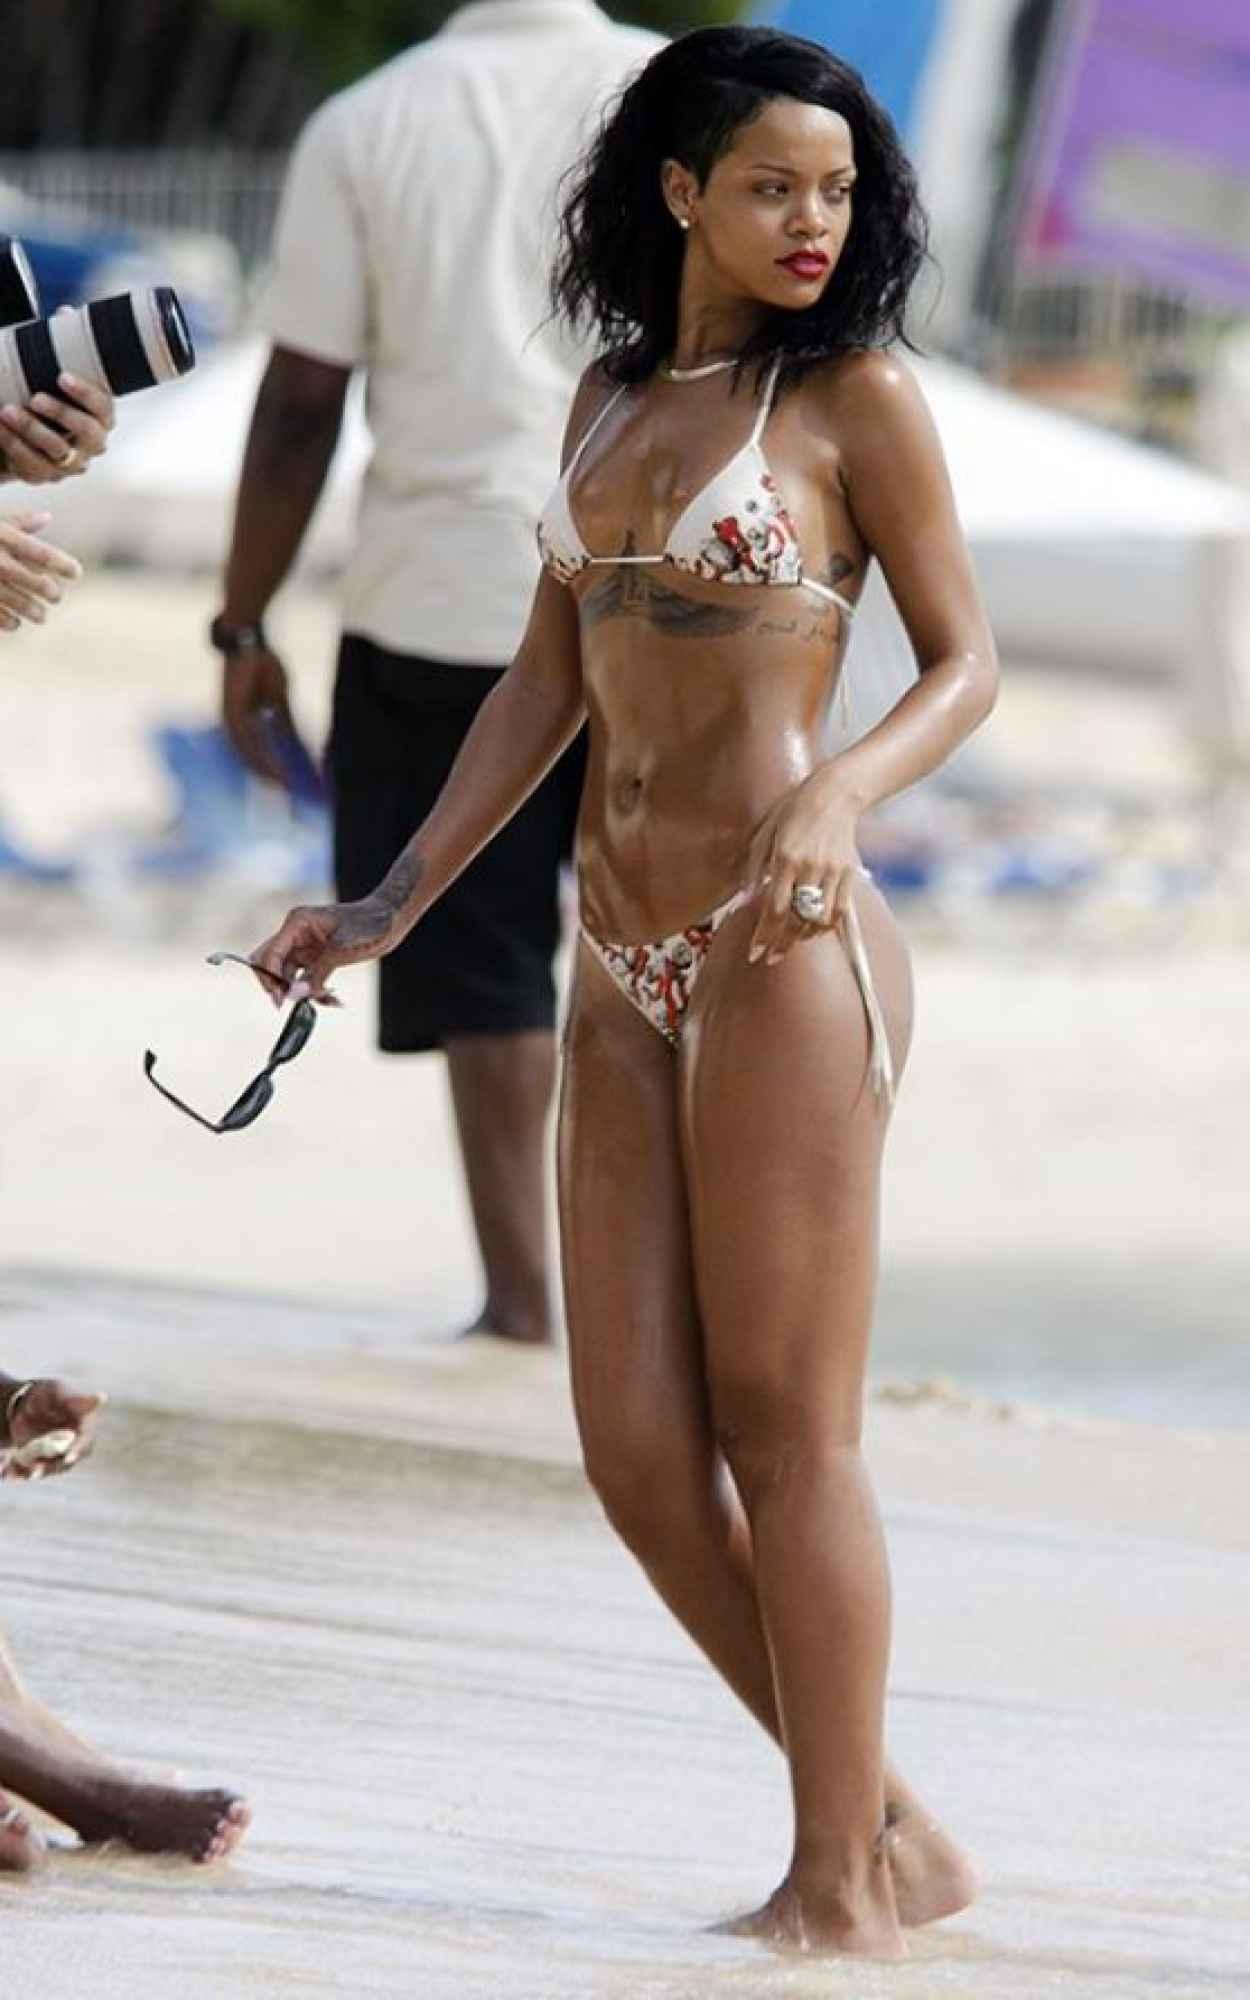 Rihanna in a Bikini at a Beach in Barbados-1